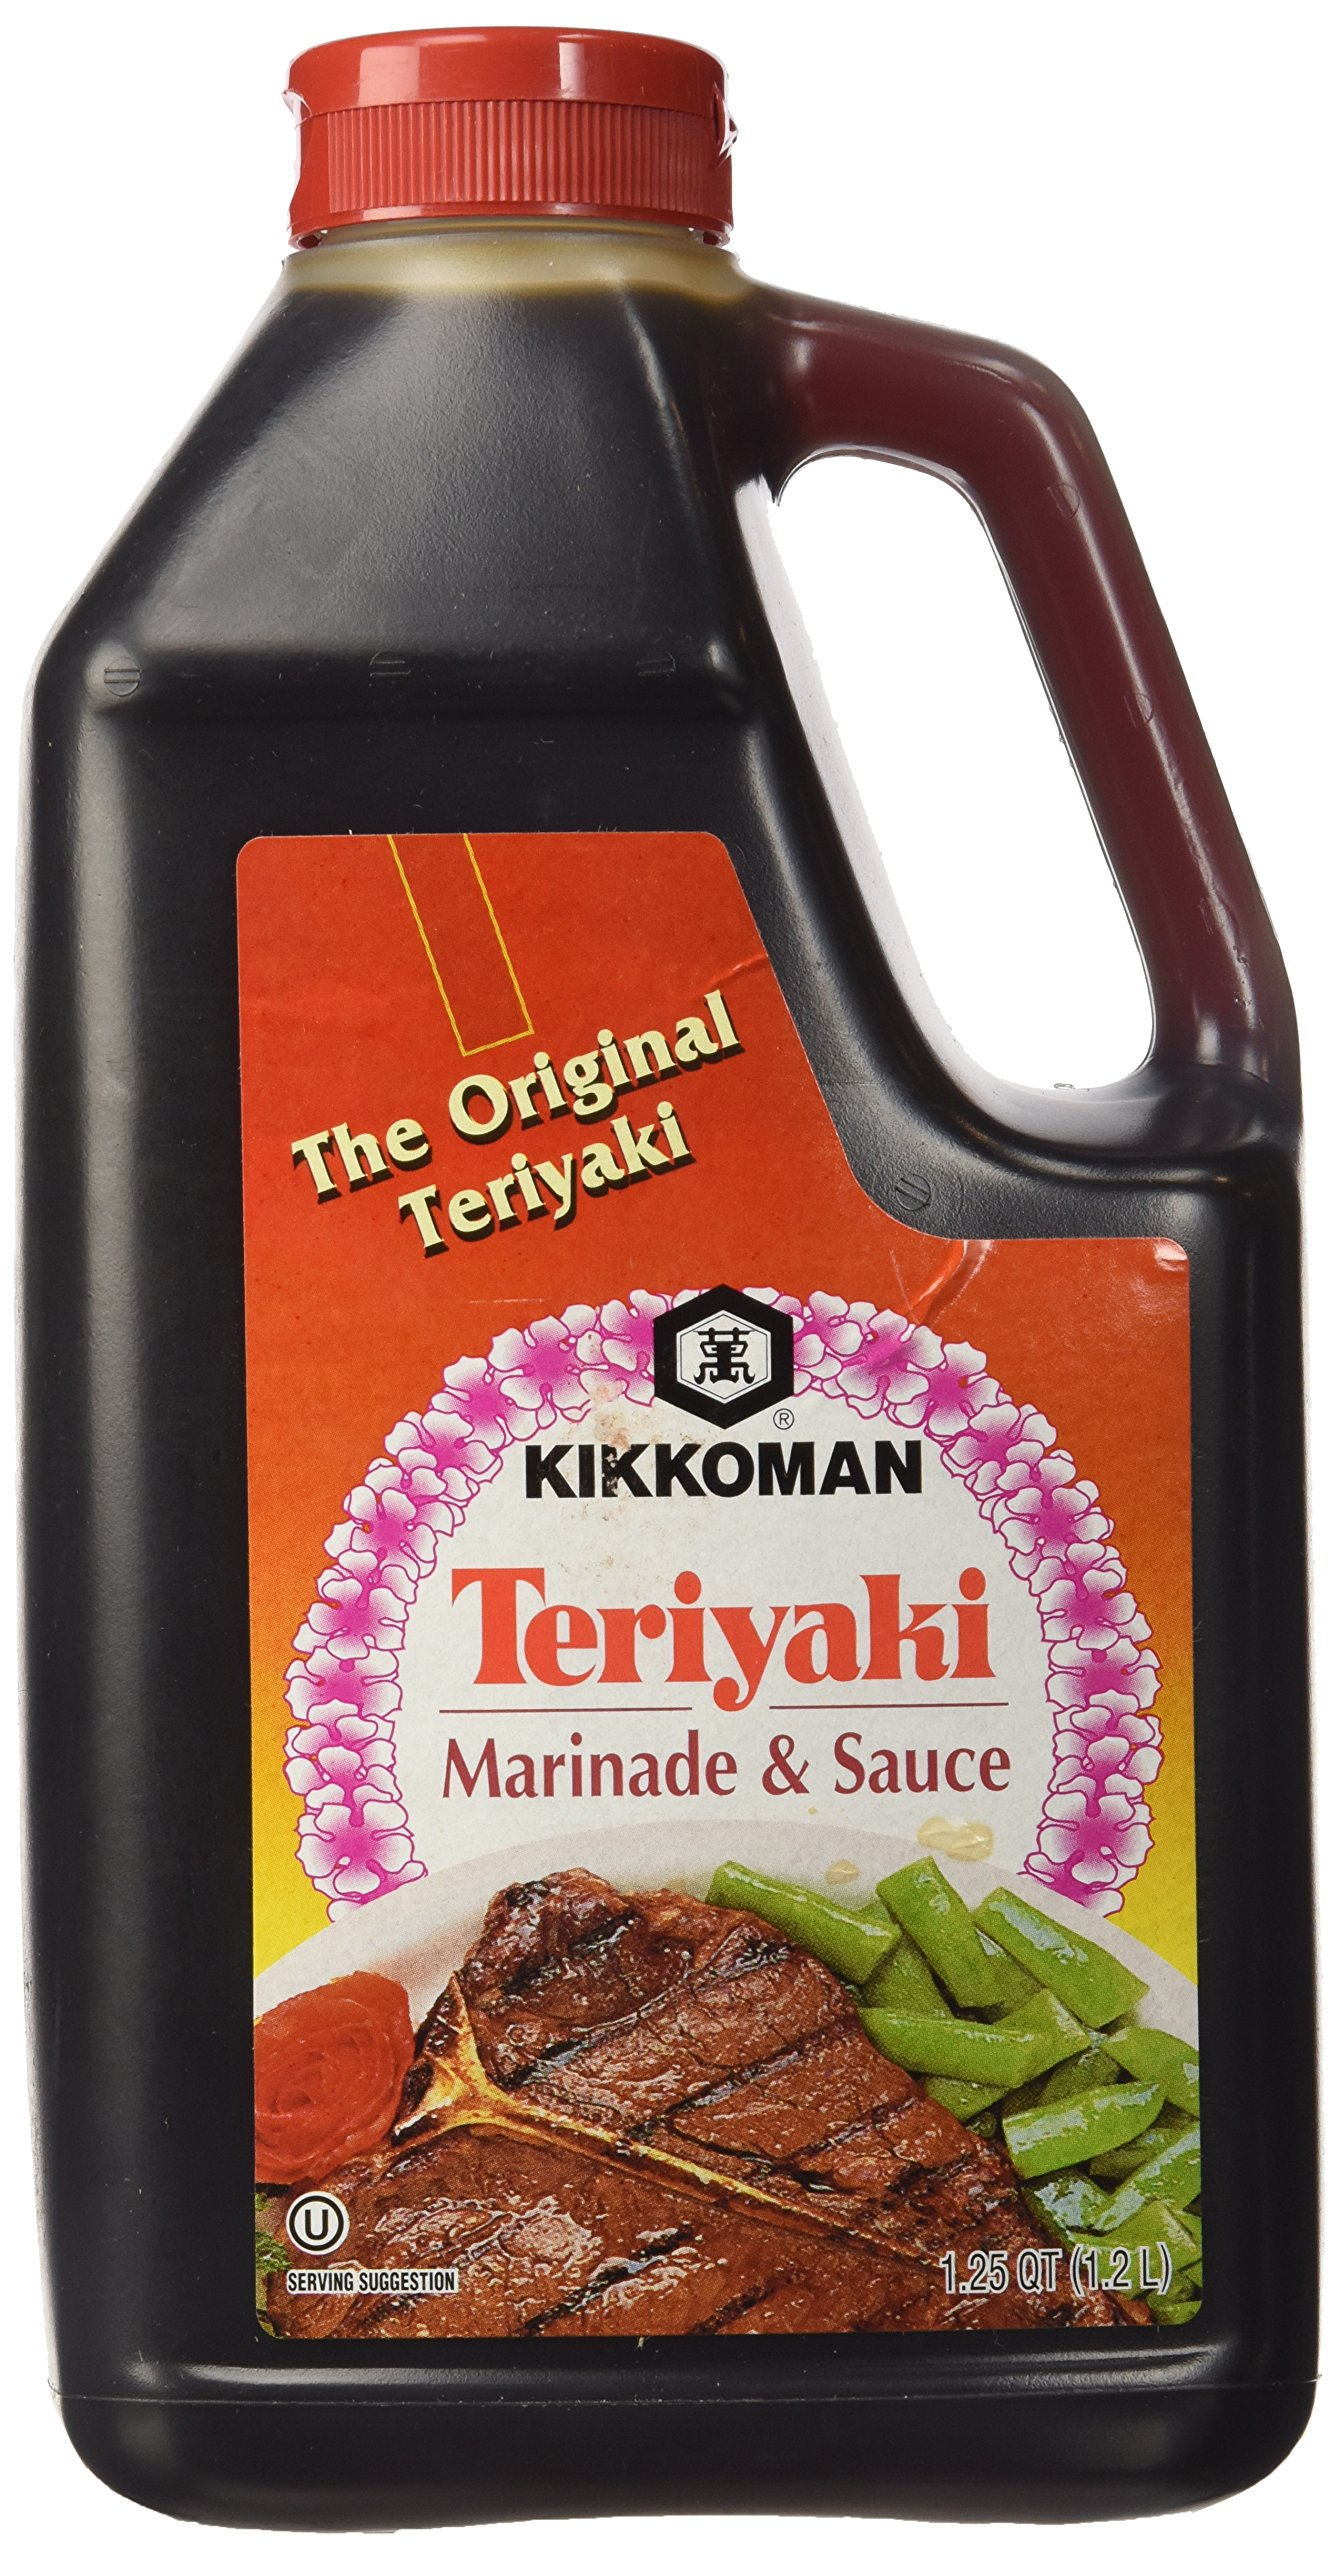 Kikkoman Teriyaki Marinade & Sauce, 40 Oz (1.25 Qt)